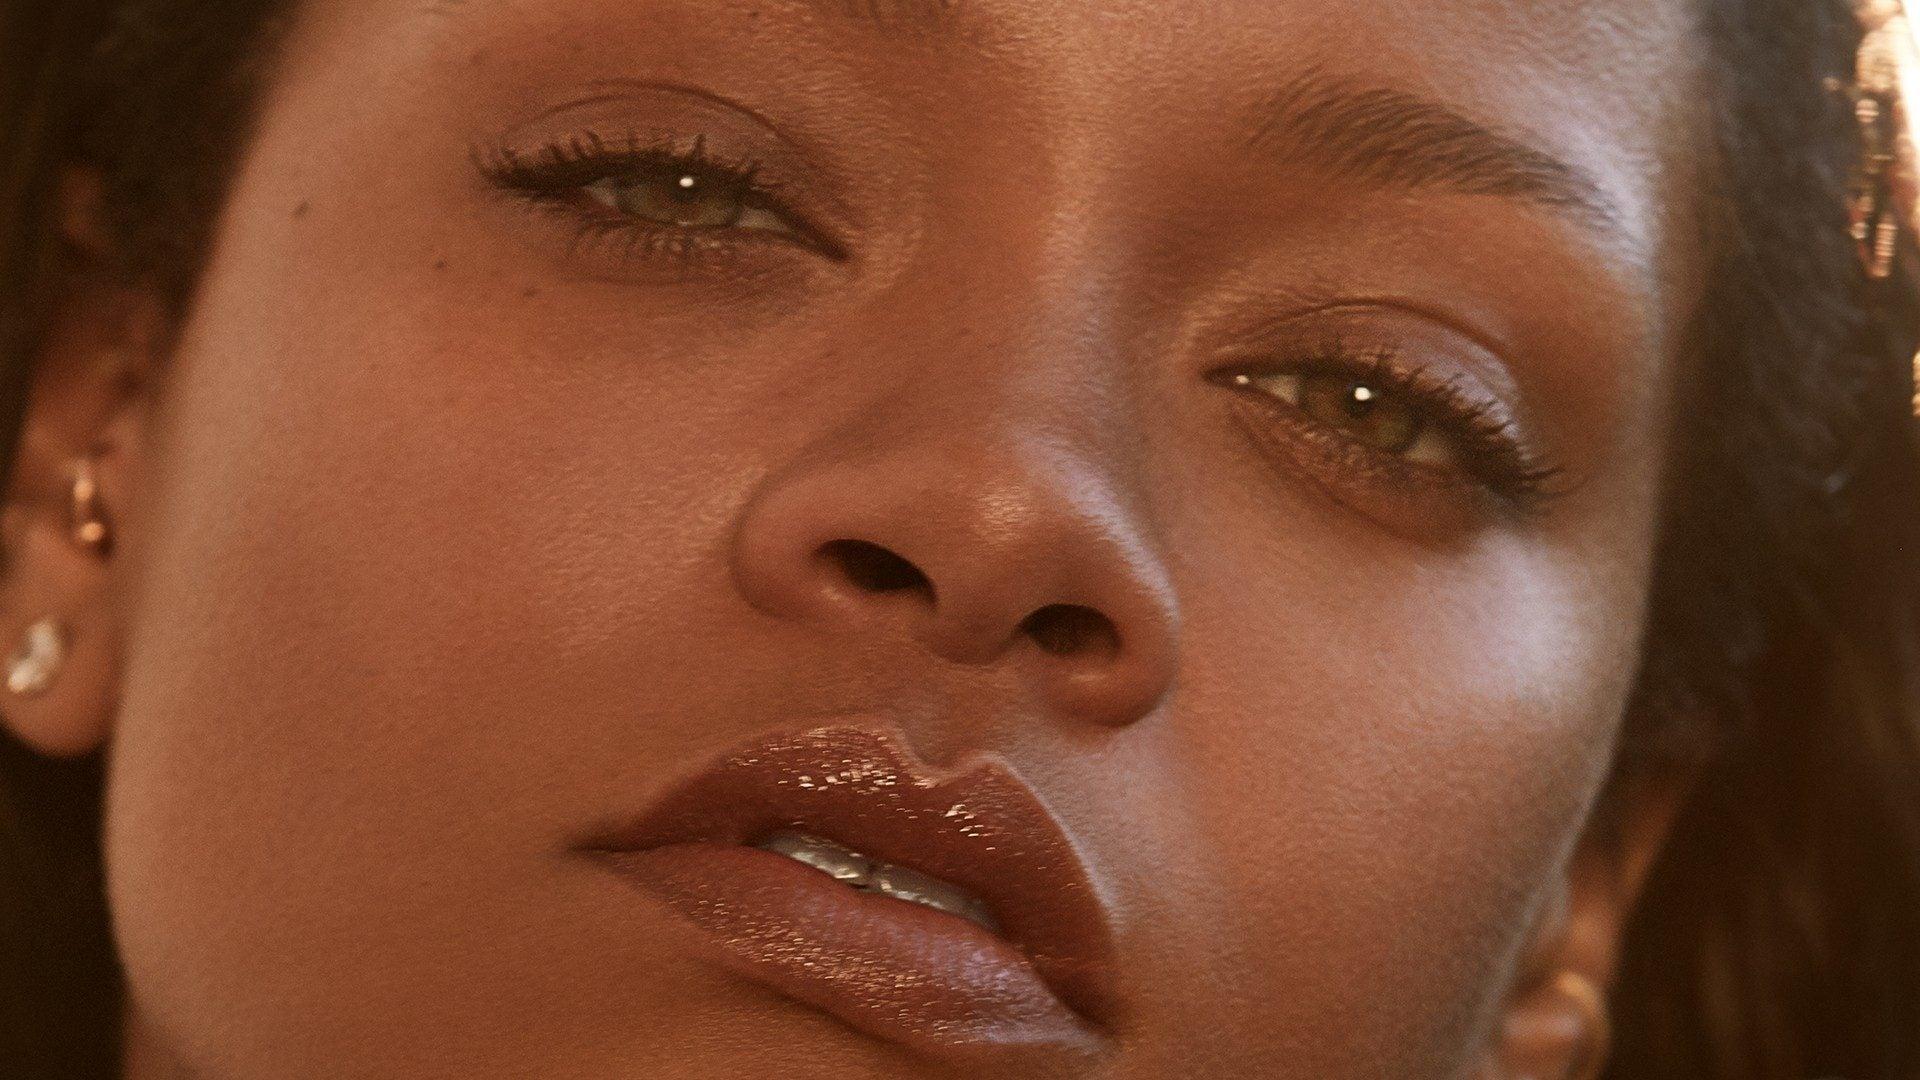 Rihanna Surprises Fans With Fenty Skin Reveal